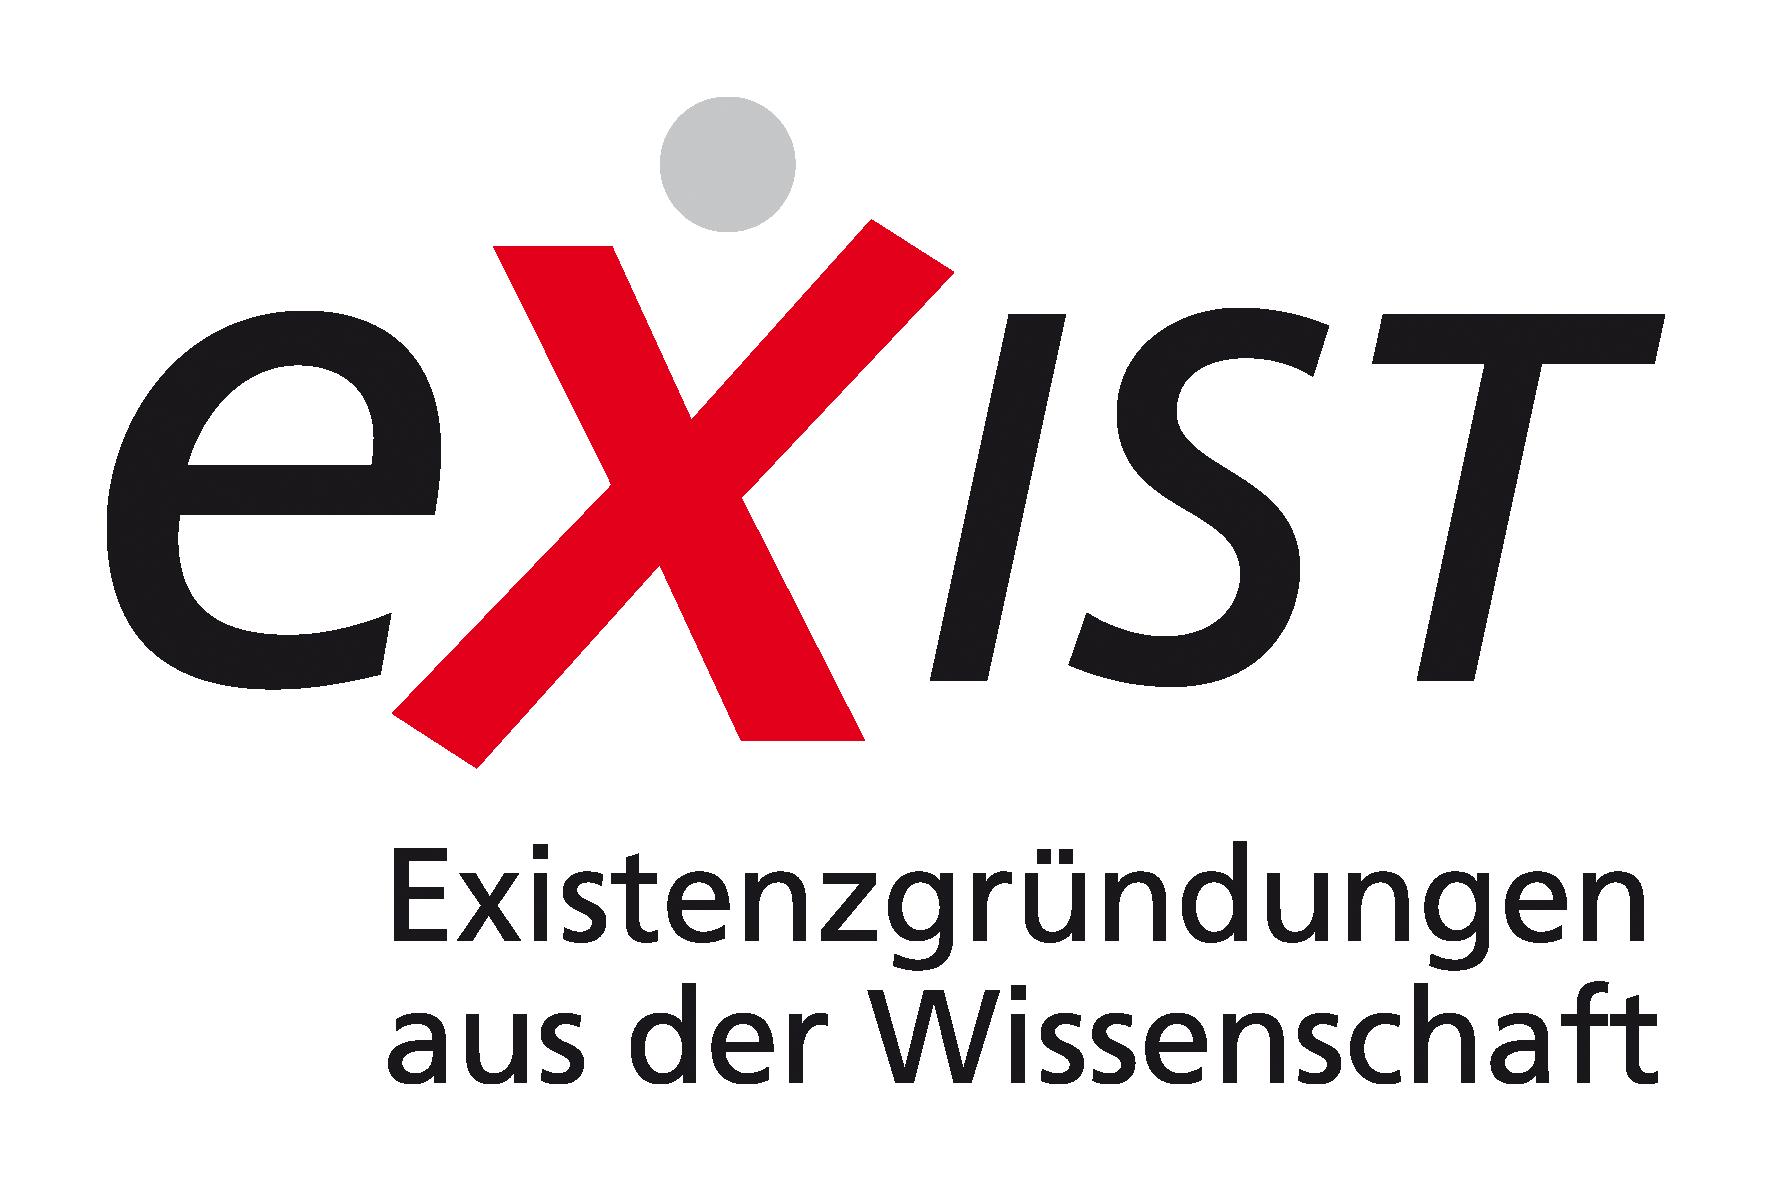 You are currently viewing Förderung durch das EXIST Gründungsstipendium